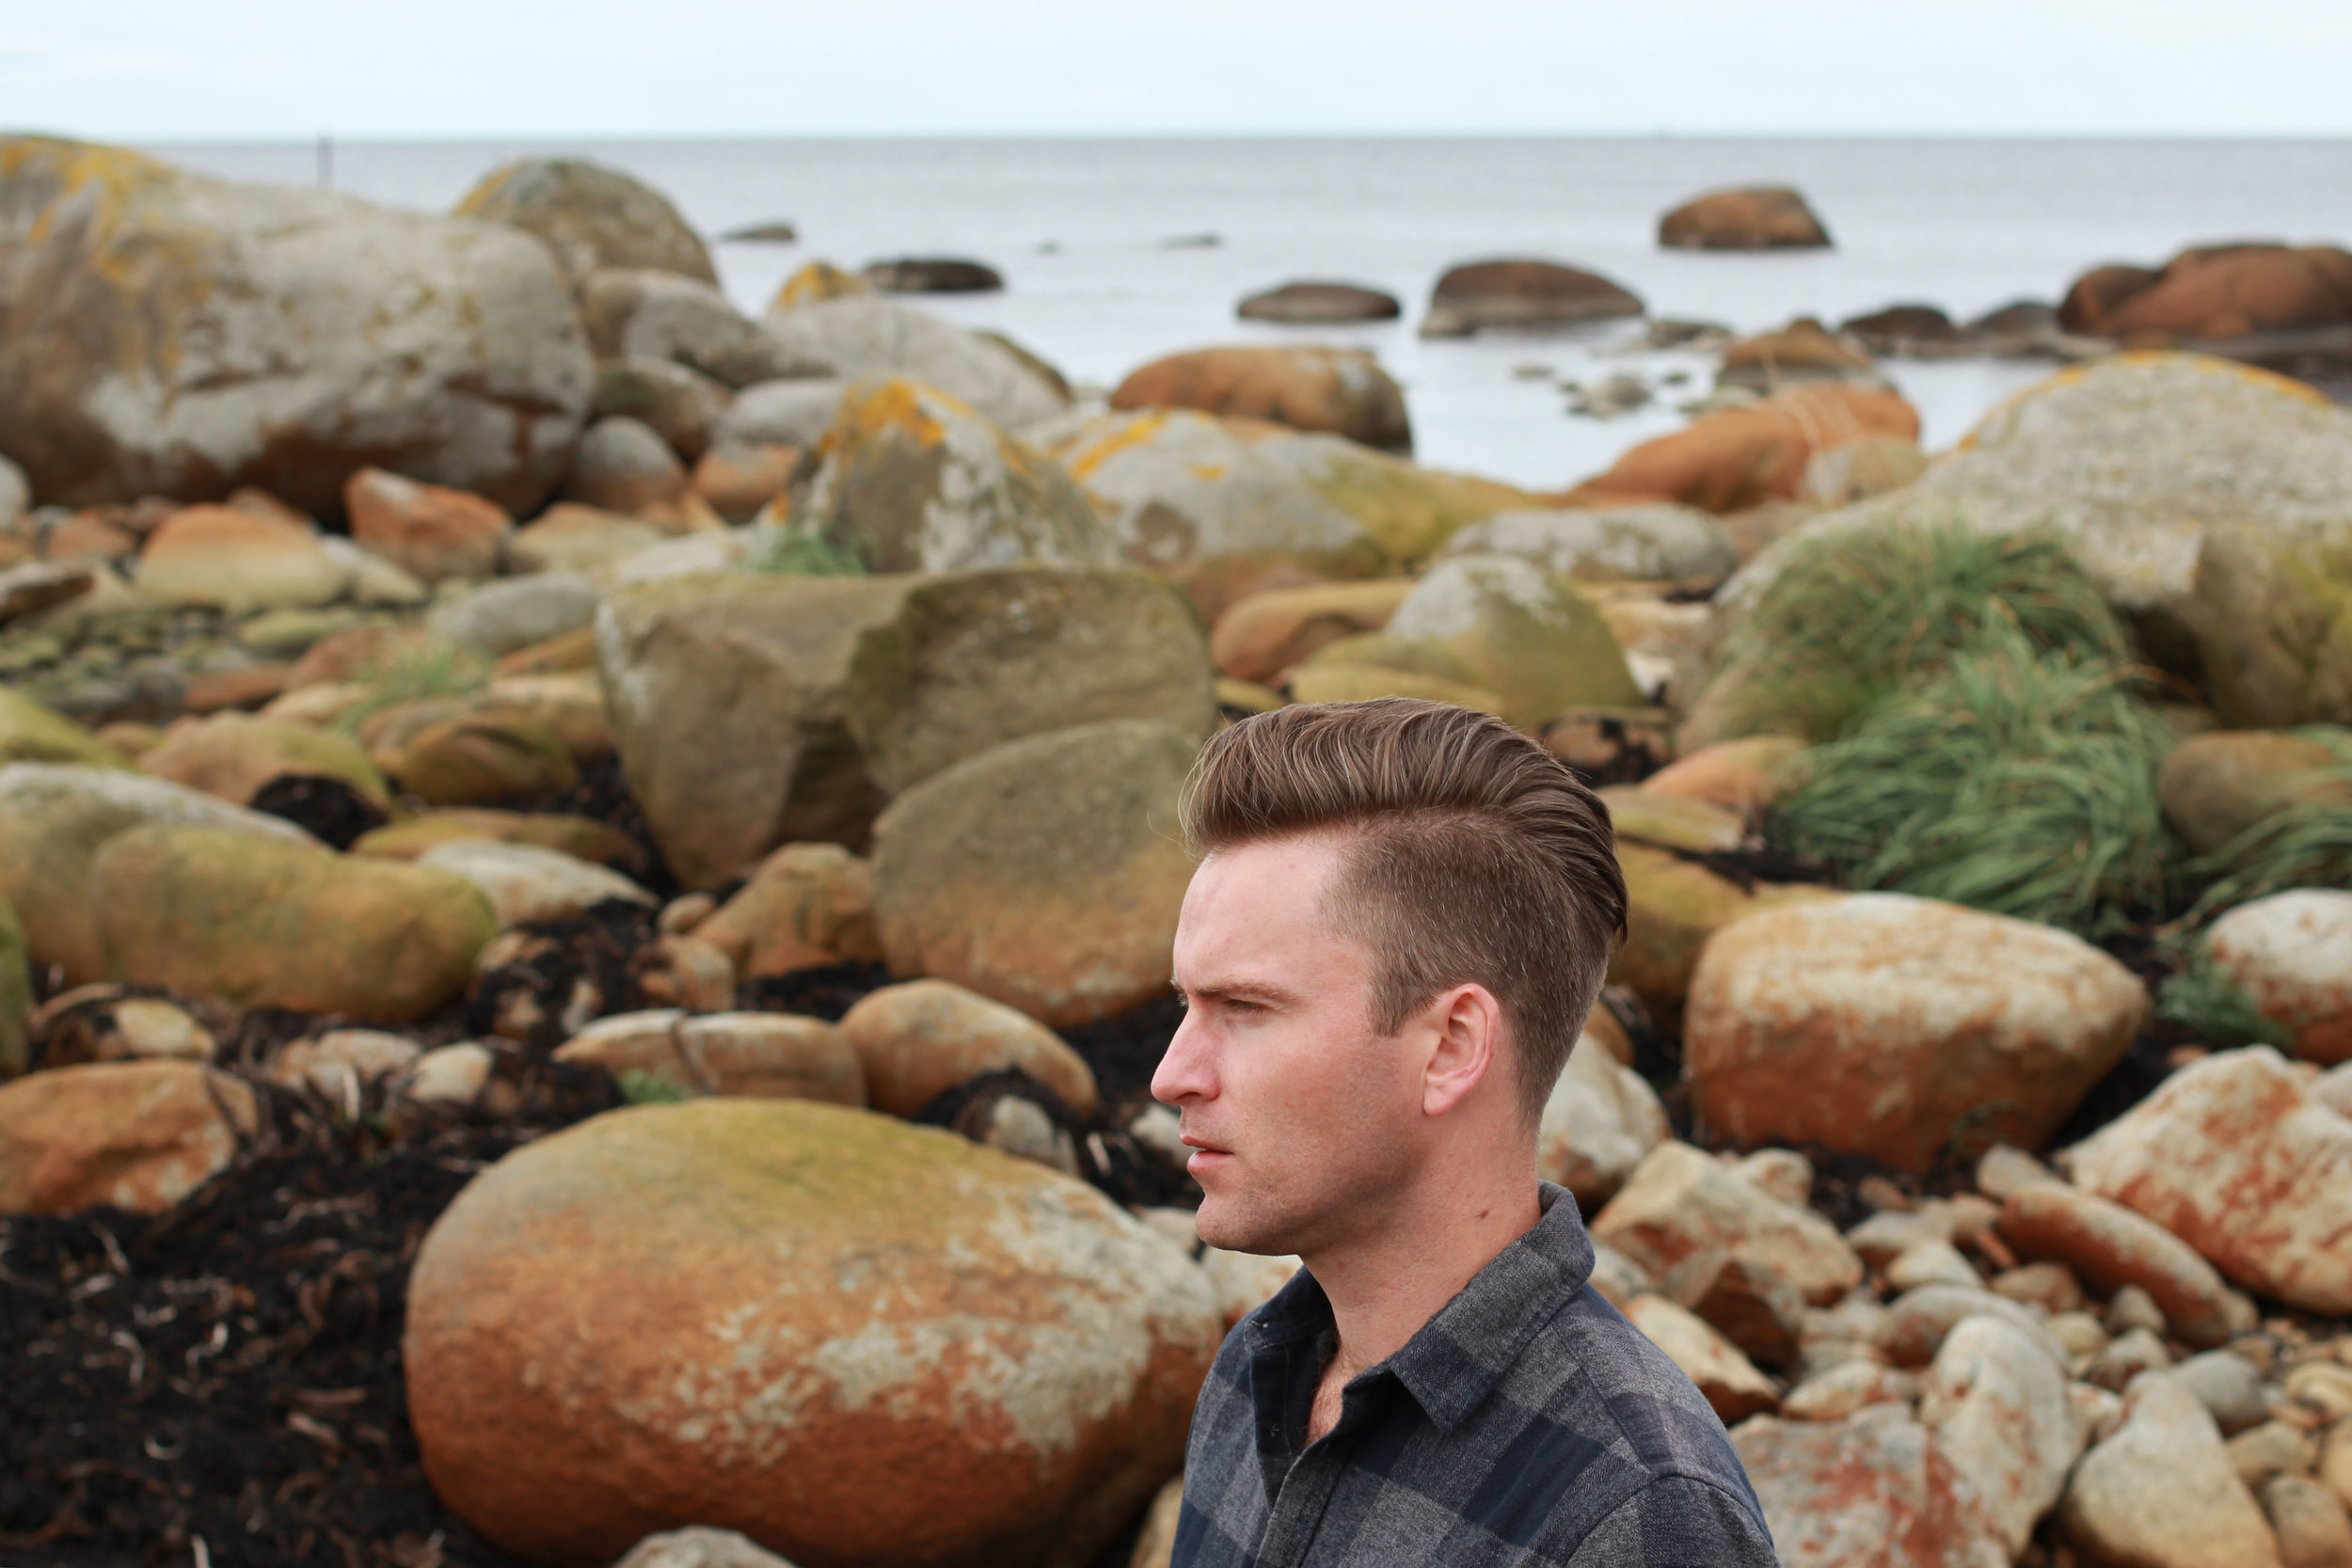 02_LarsJakobRudjord_photo_IngvildKoksvik.jpg